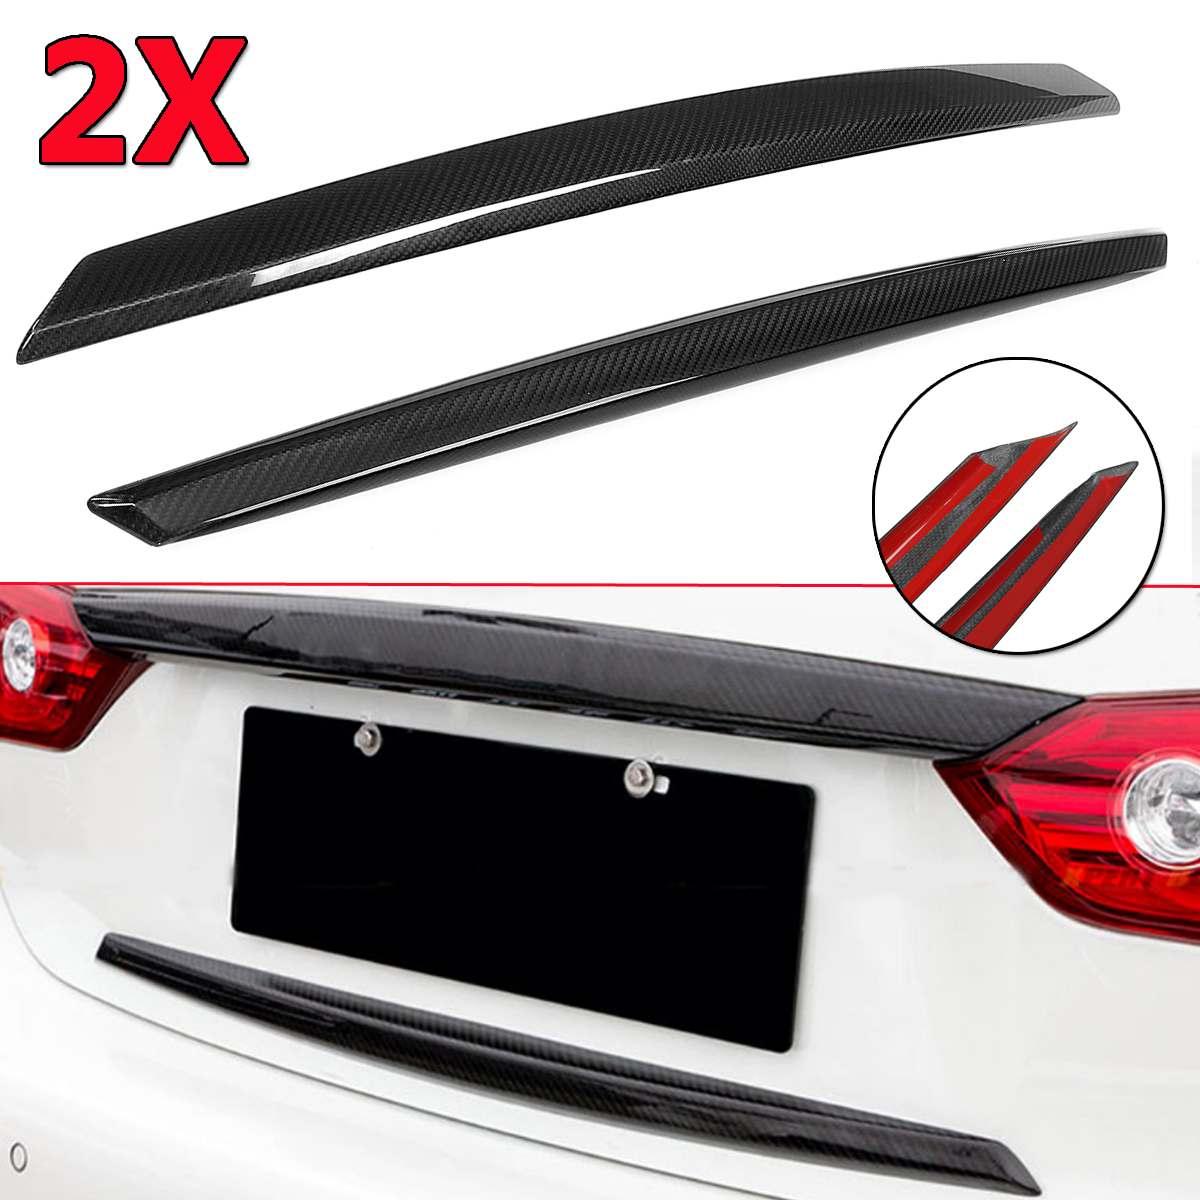 For 2014-17 Infiniti Q50 Carbon Fiber Rear Bumper Side Corner Splitters Aprons